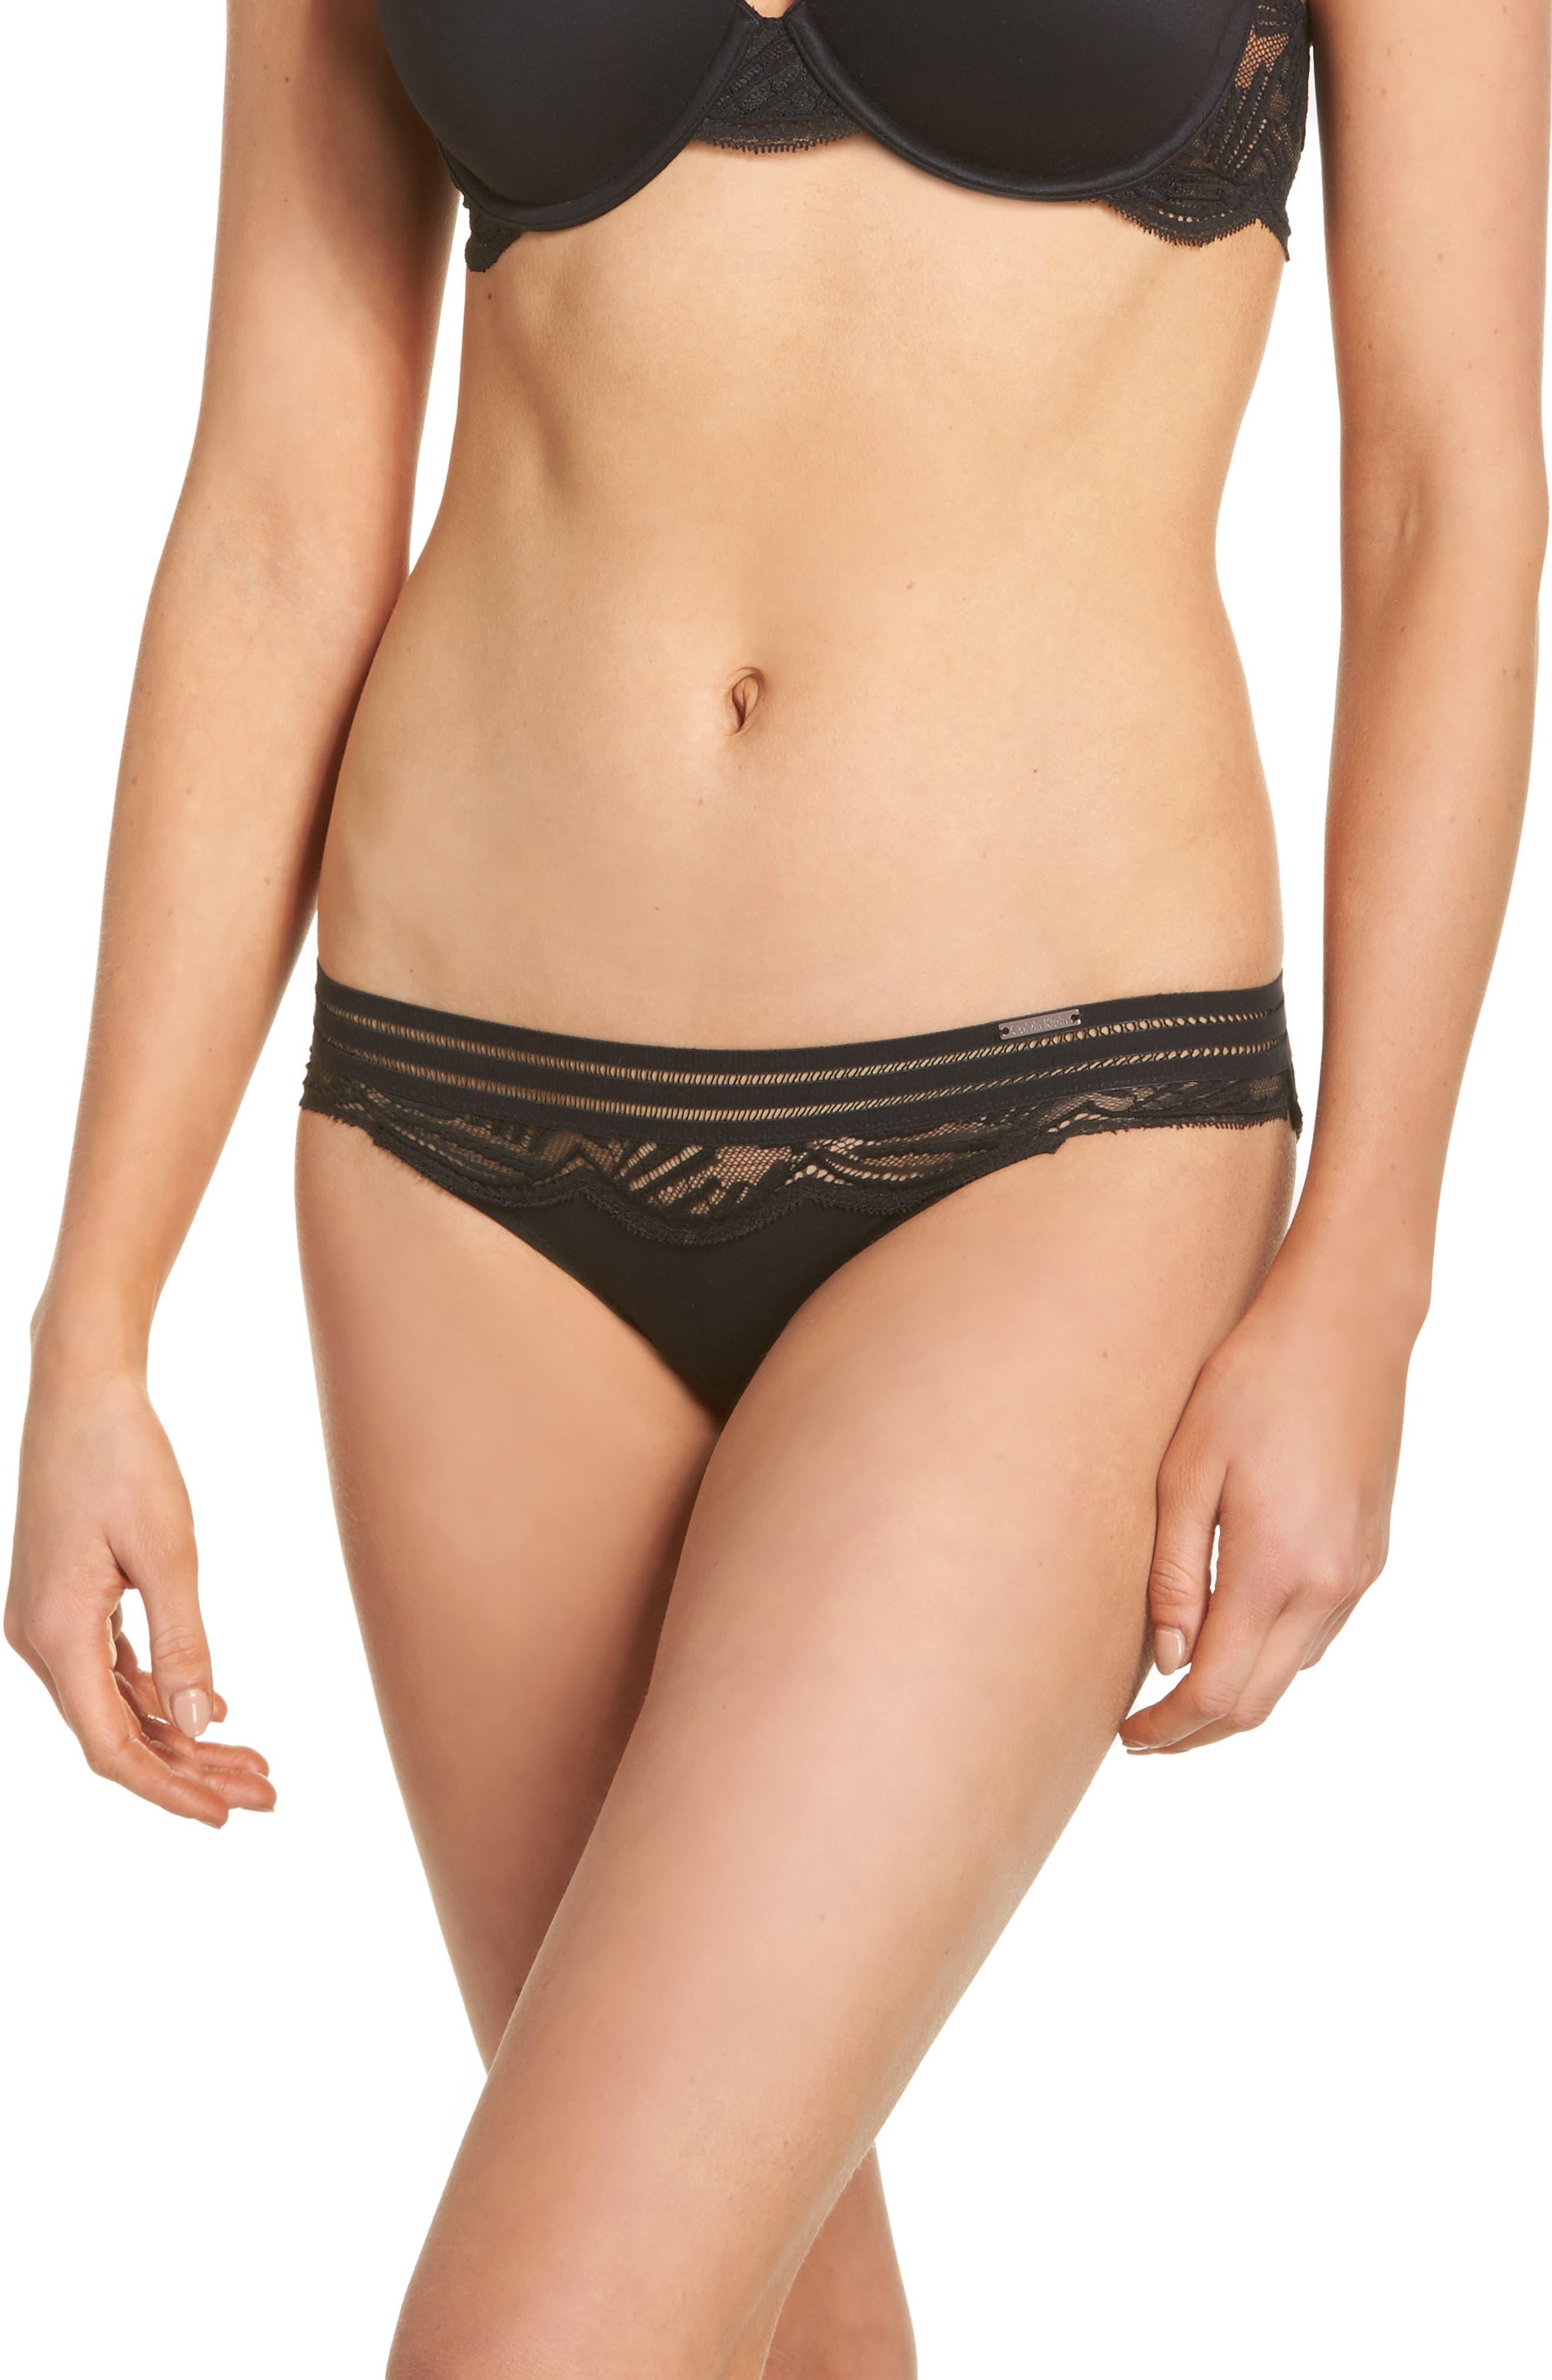 PF Slipcover Bikini,                             Main thumbnail 1, color,